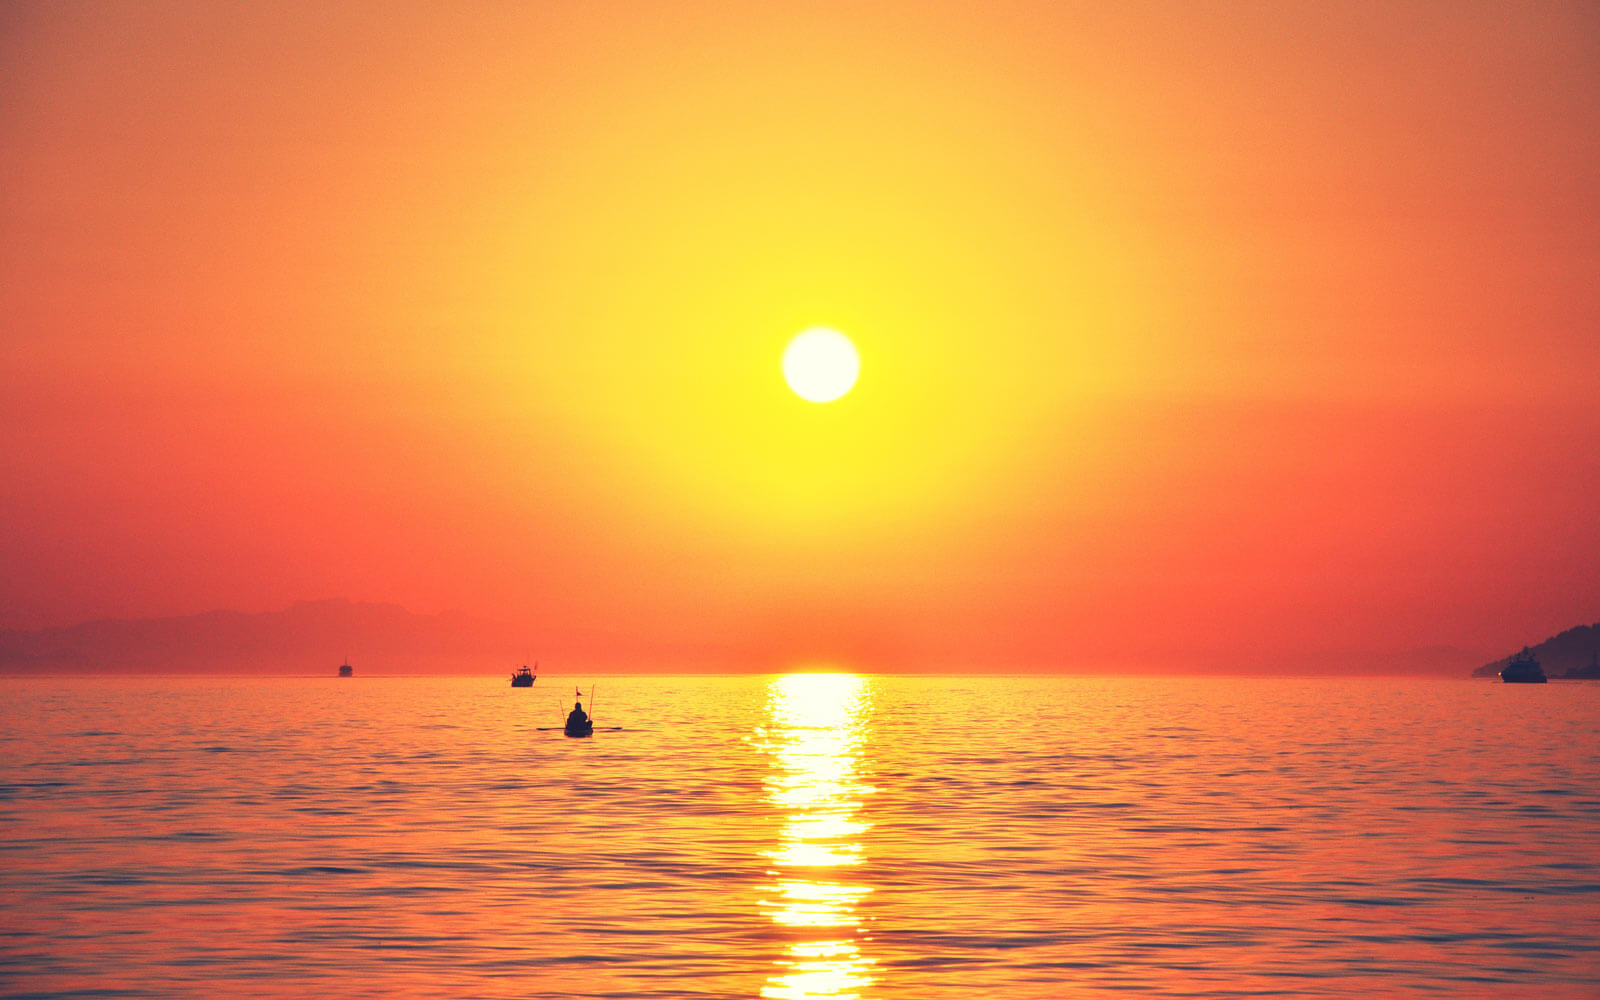 Sonnenuntergang-Ambleside-Kanada